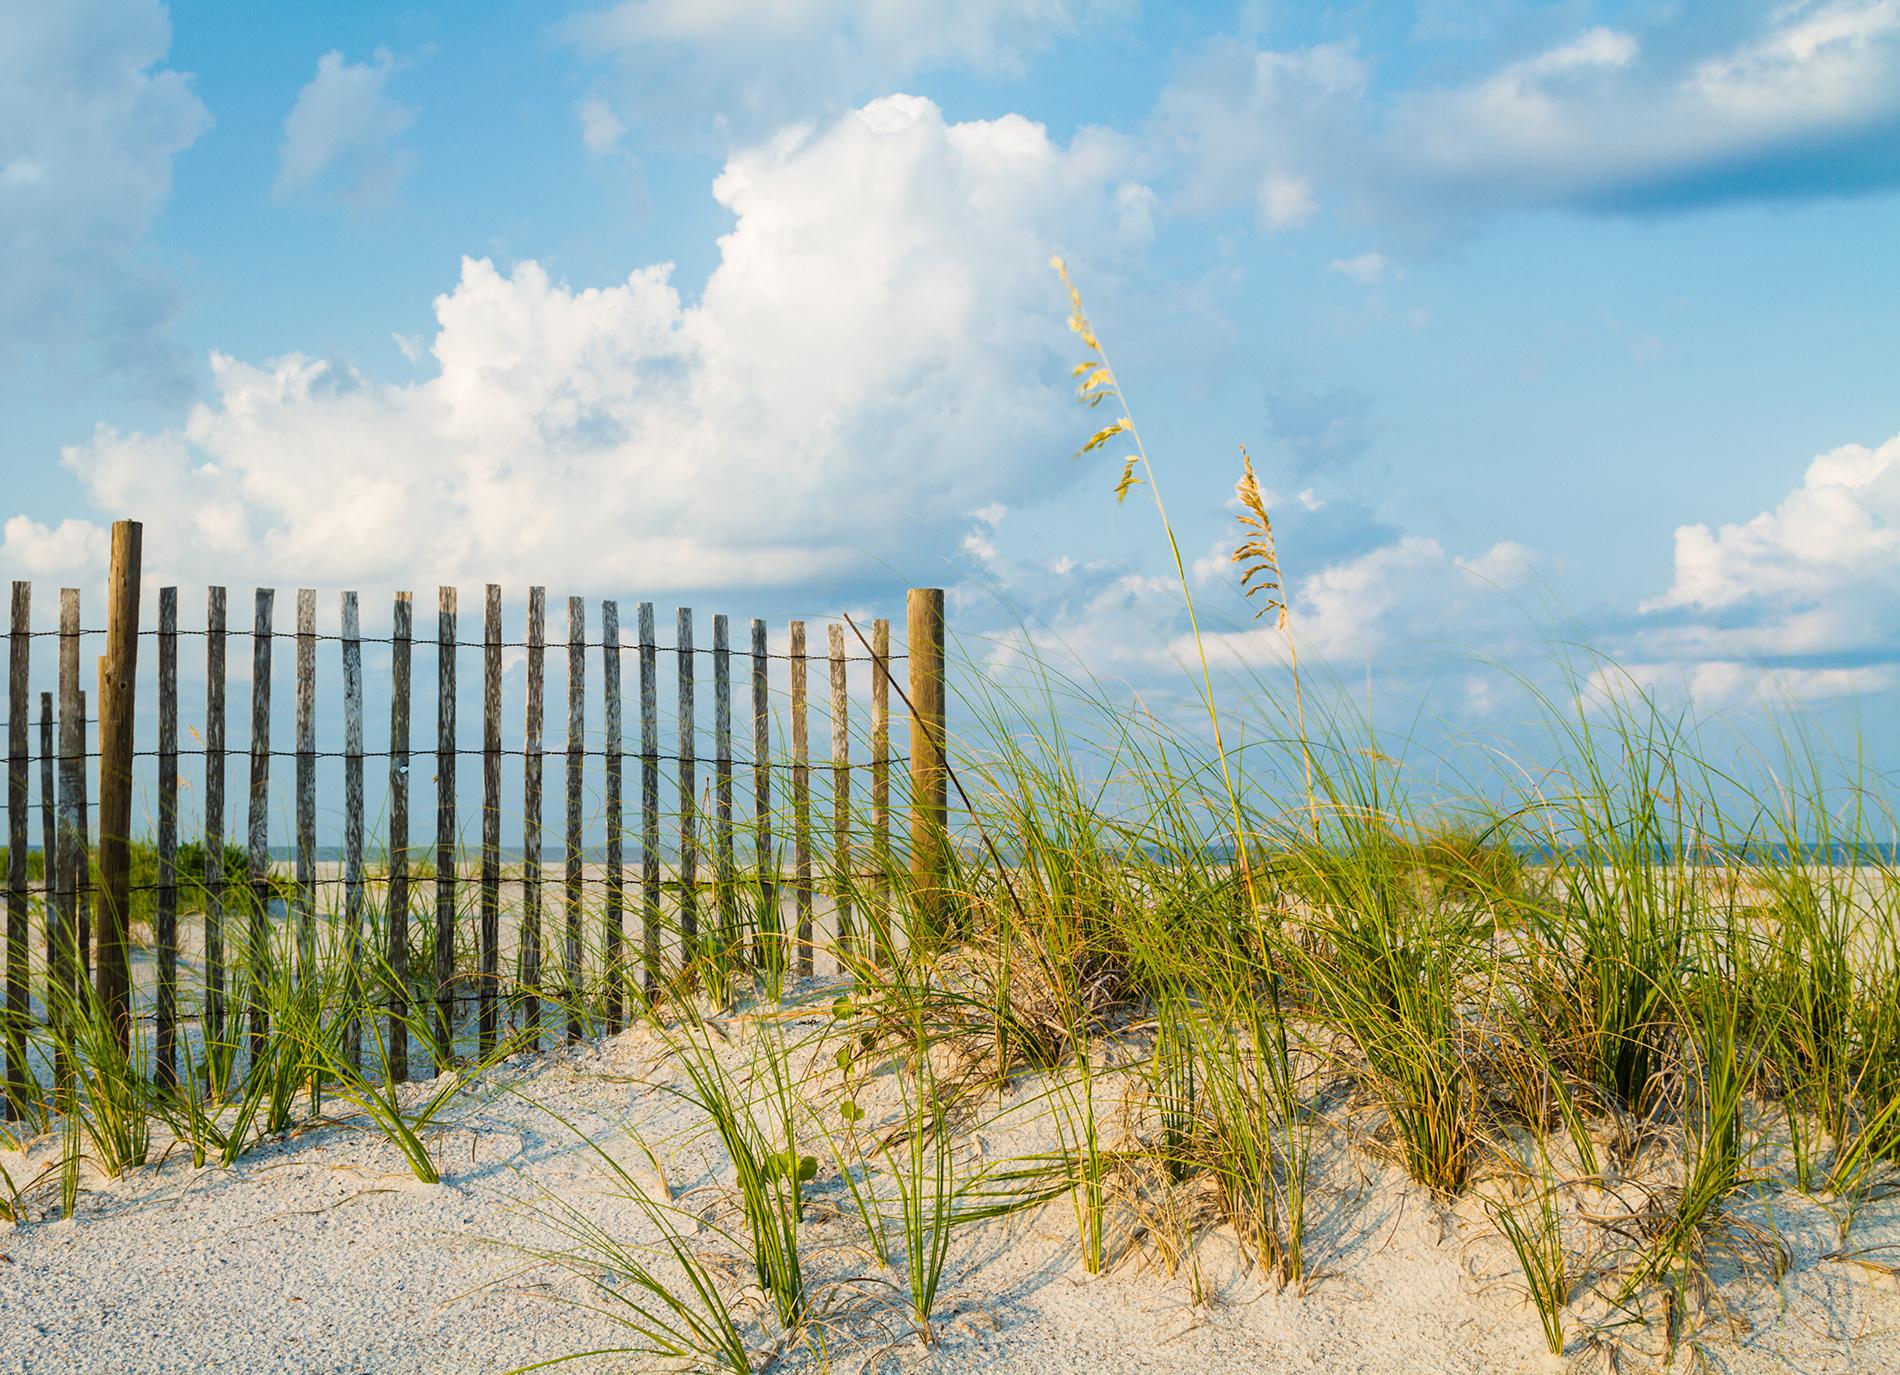 Skyline - amelia dunes fl